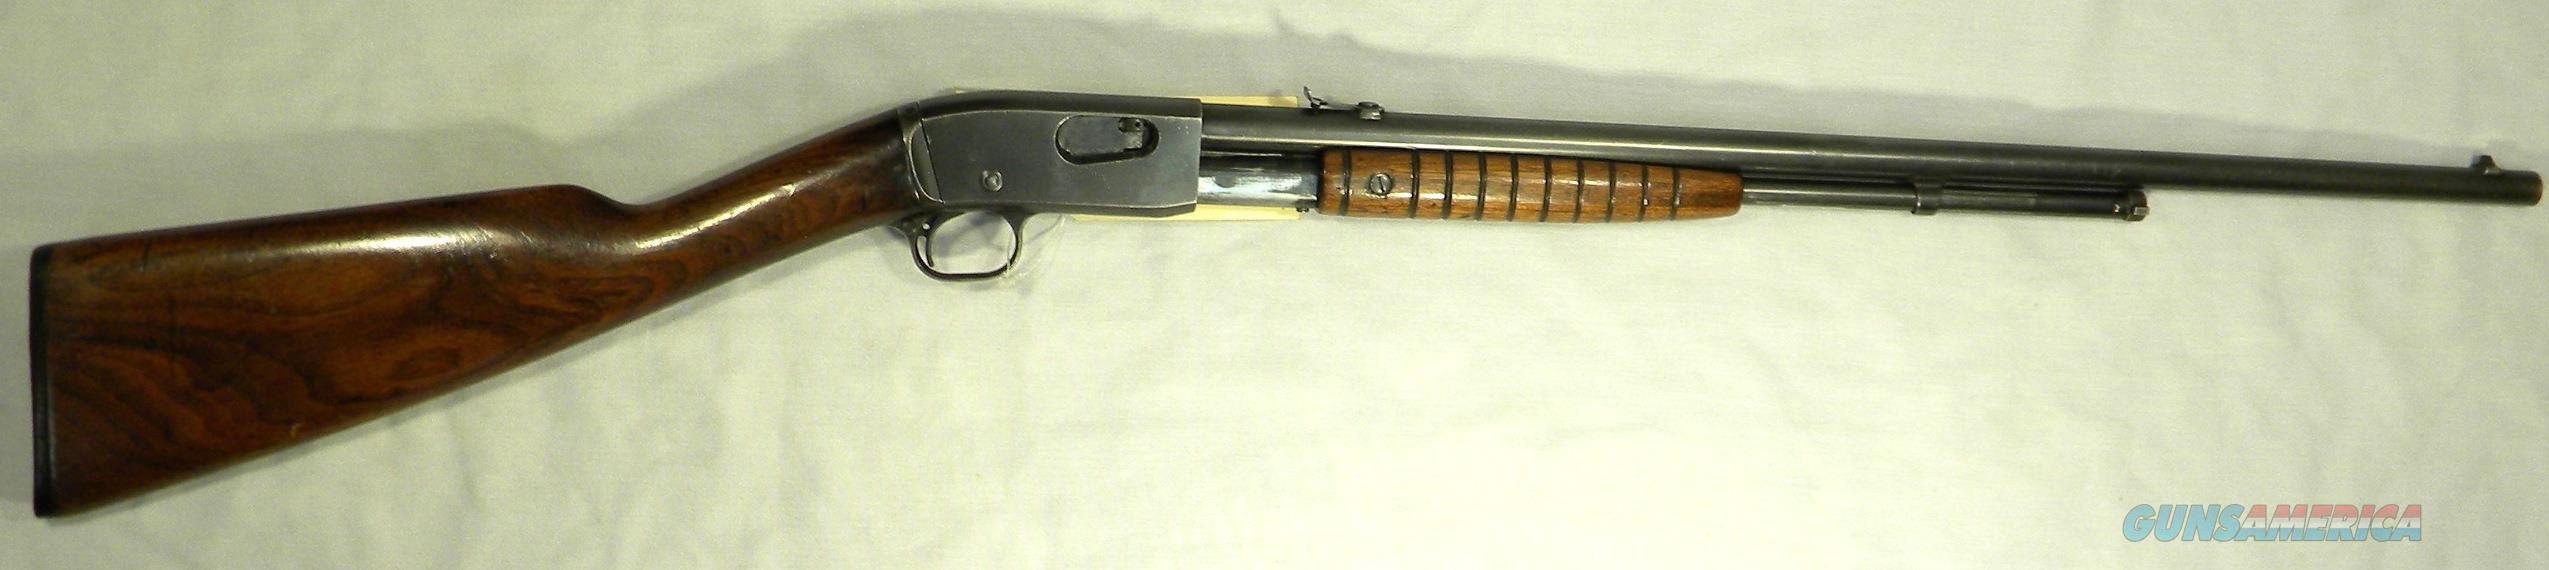 Remington 12A Take-Down, .22 Short, Long, Long Rifle Pump-Action Rifle  Guns > Rifles > Remington Rifles - Modern > .22 Rimfire Models